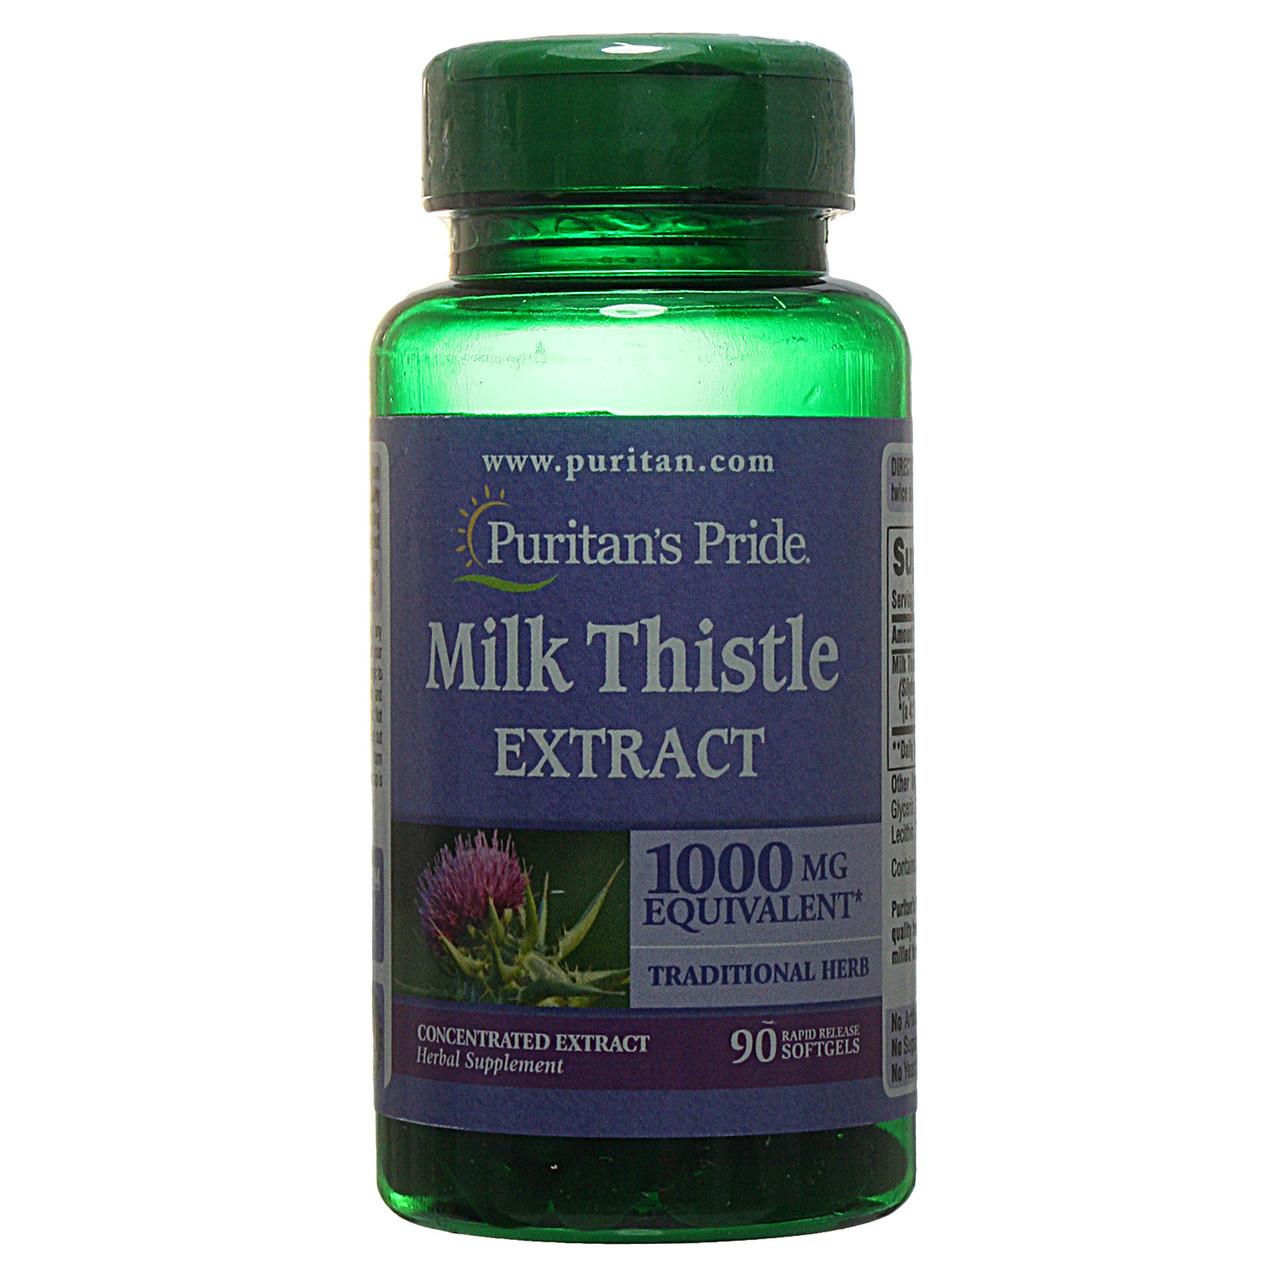 Расторопша экстракт (Силумарин), Milk Thistle 1000 mg (Silymarin), Puritan's Pride, 90 капсул